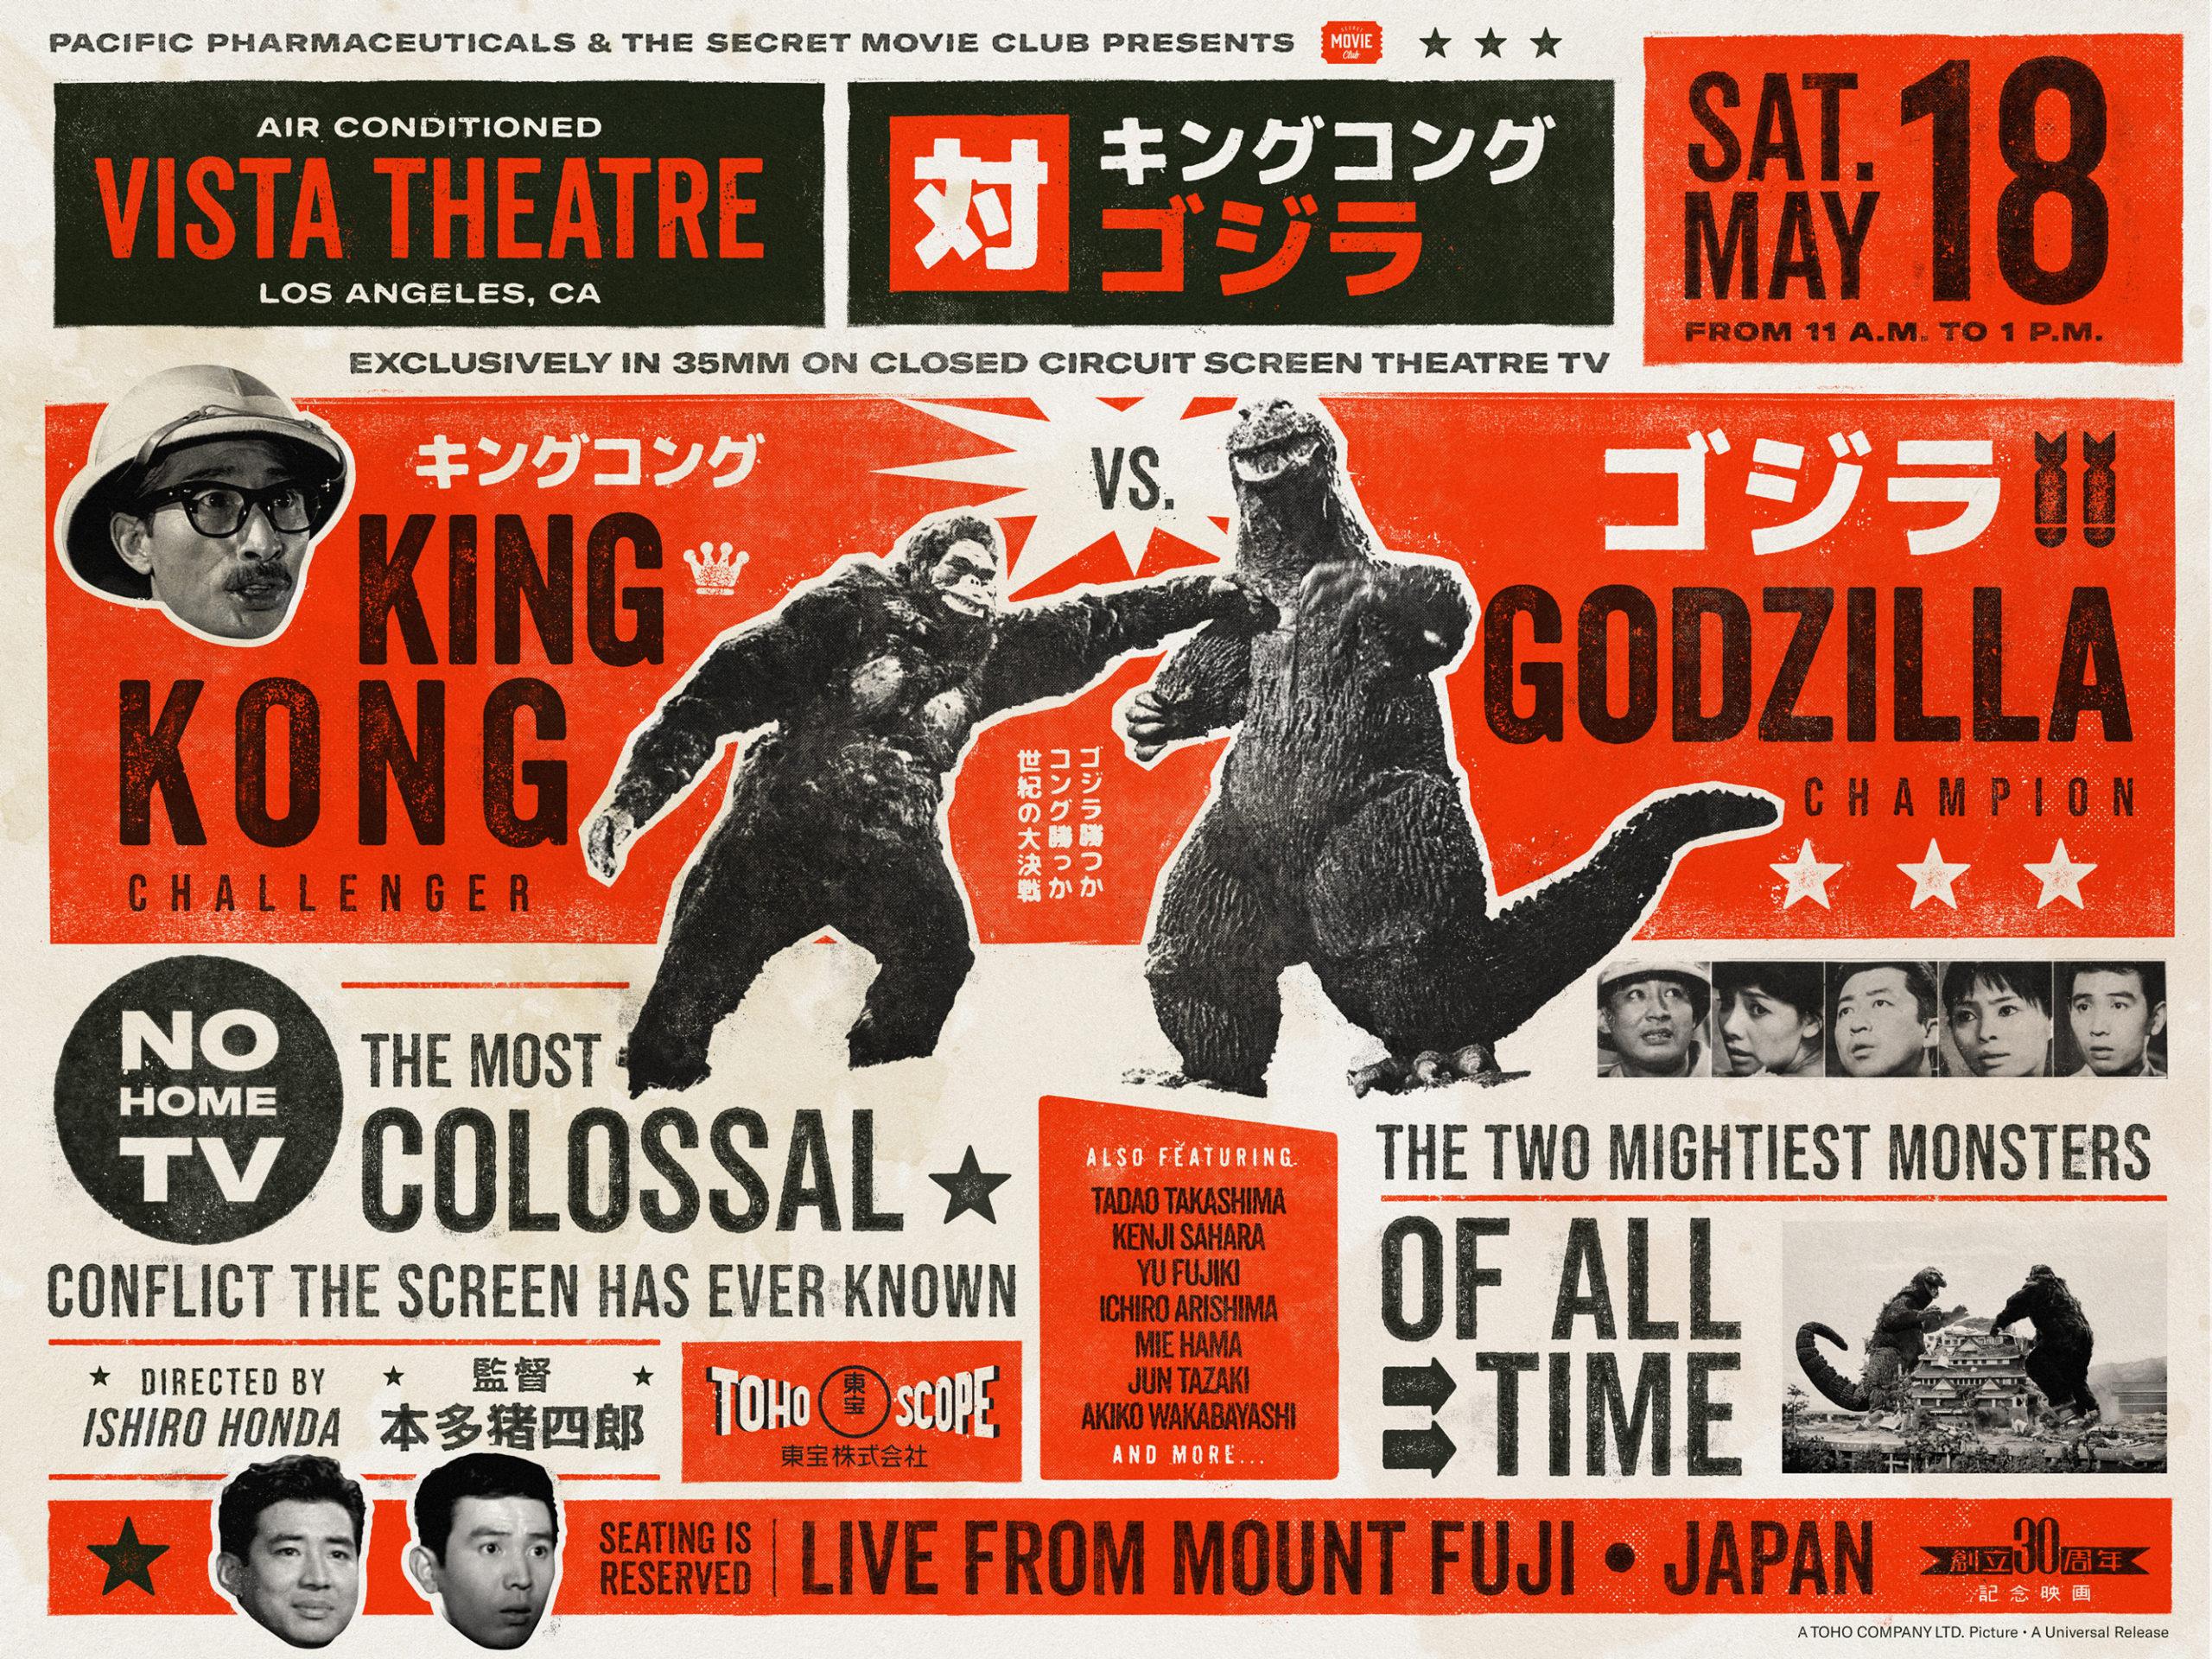 KingKong_vs_Godzilla_For_Web